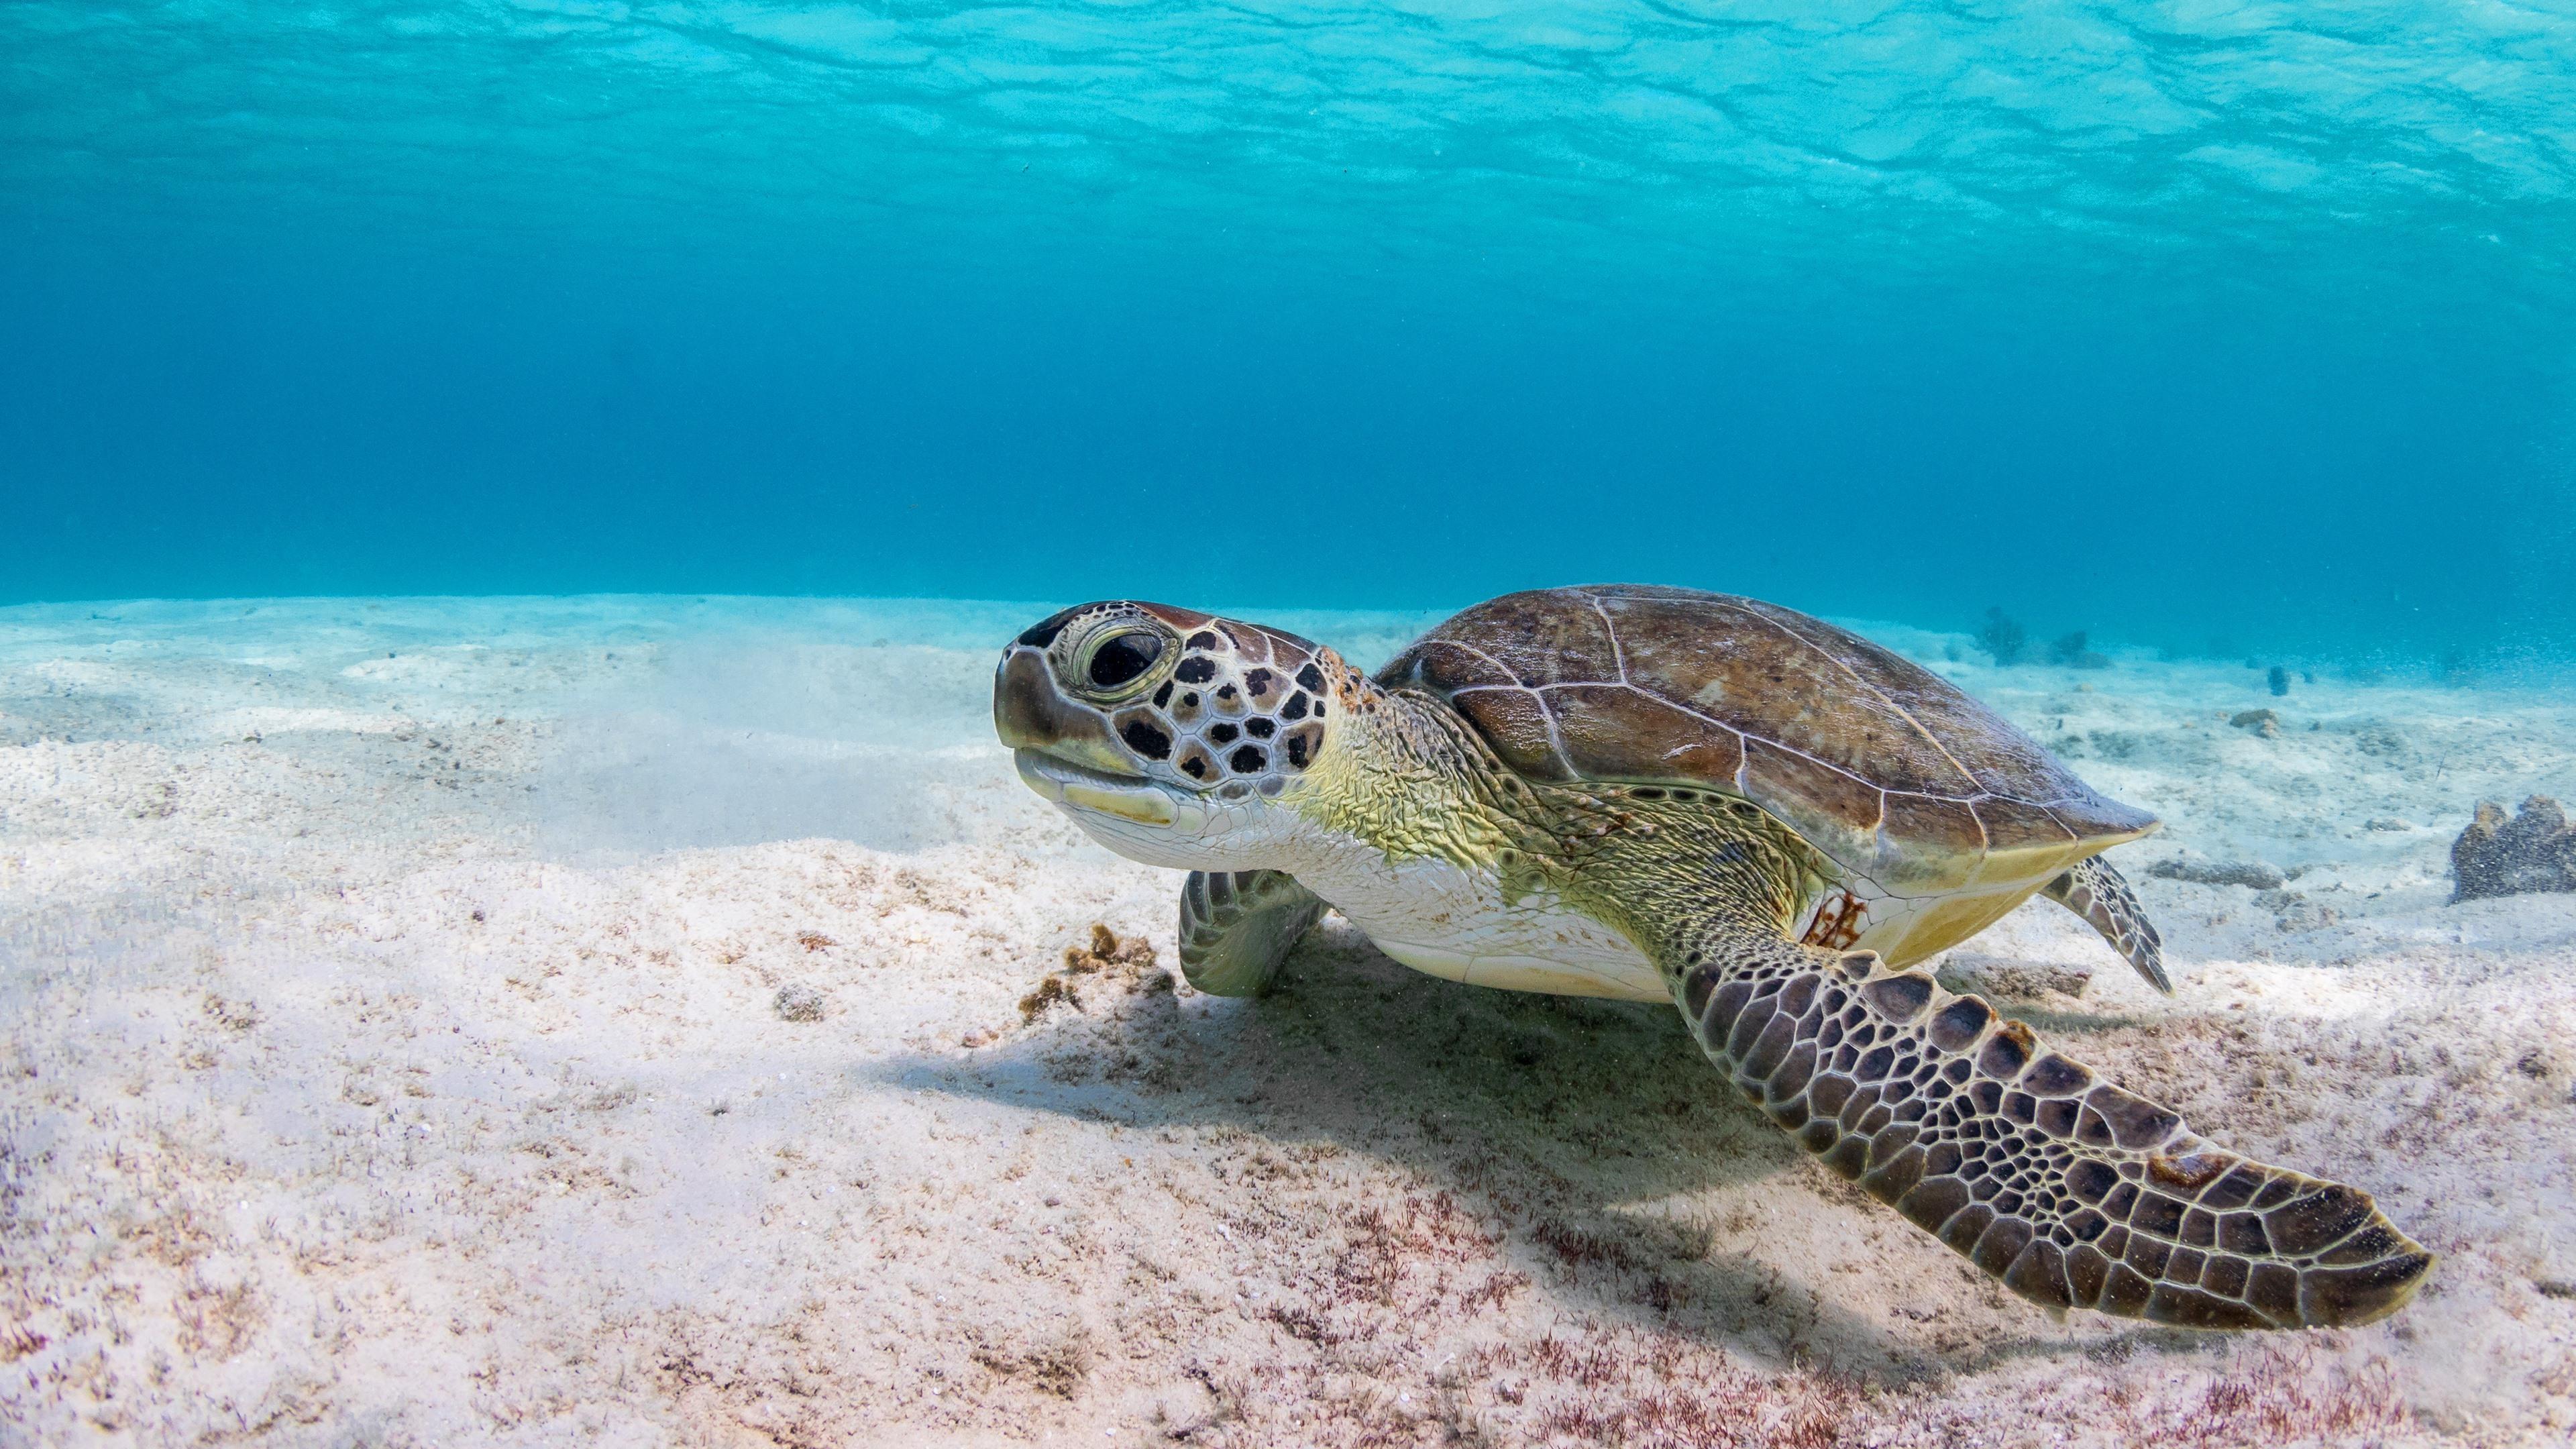 Wallpaper Turtle, underwater, sea 3840x2160 UHD 4K Picture ...